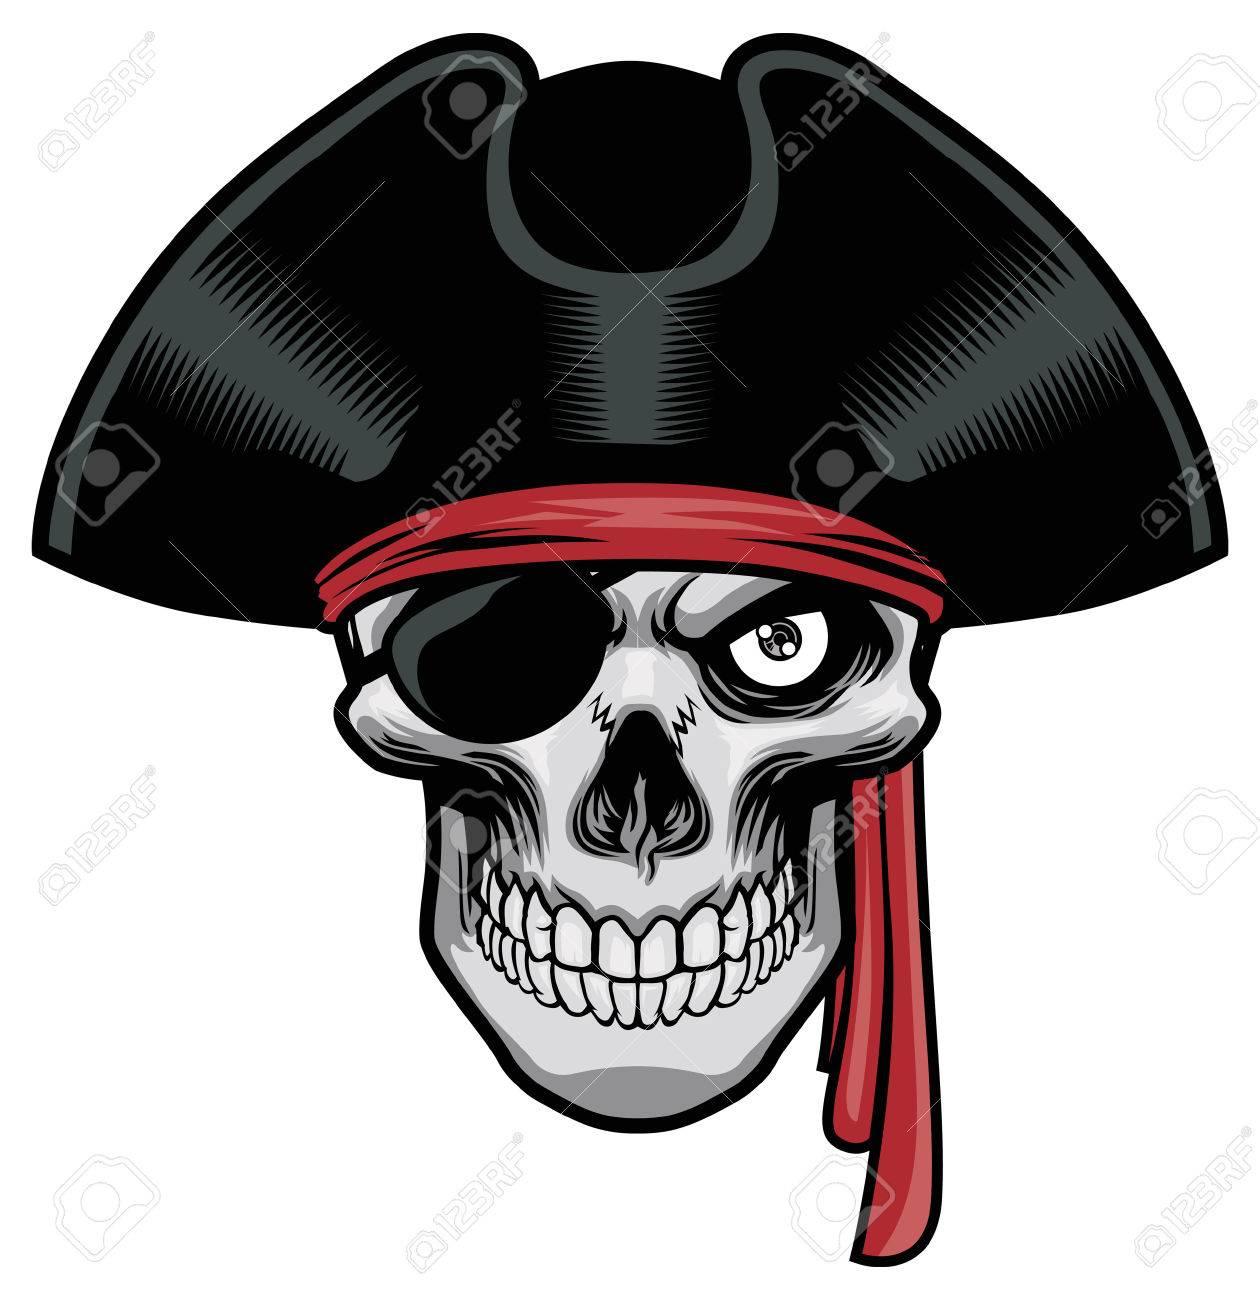 skull of pirate - 59267197